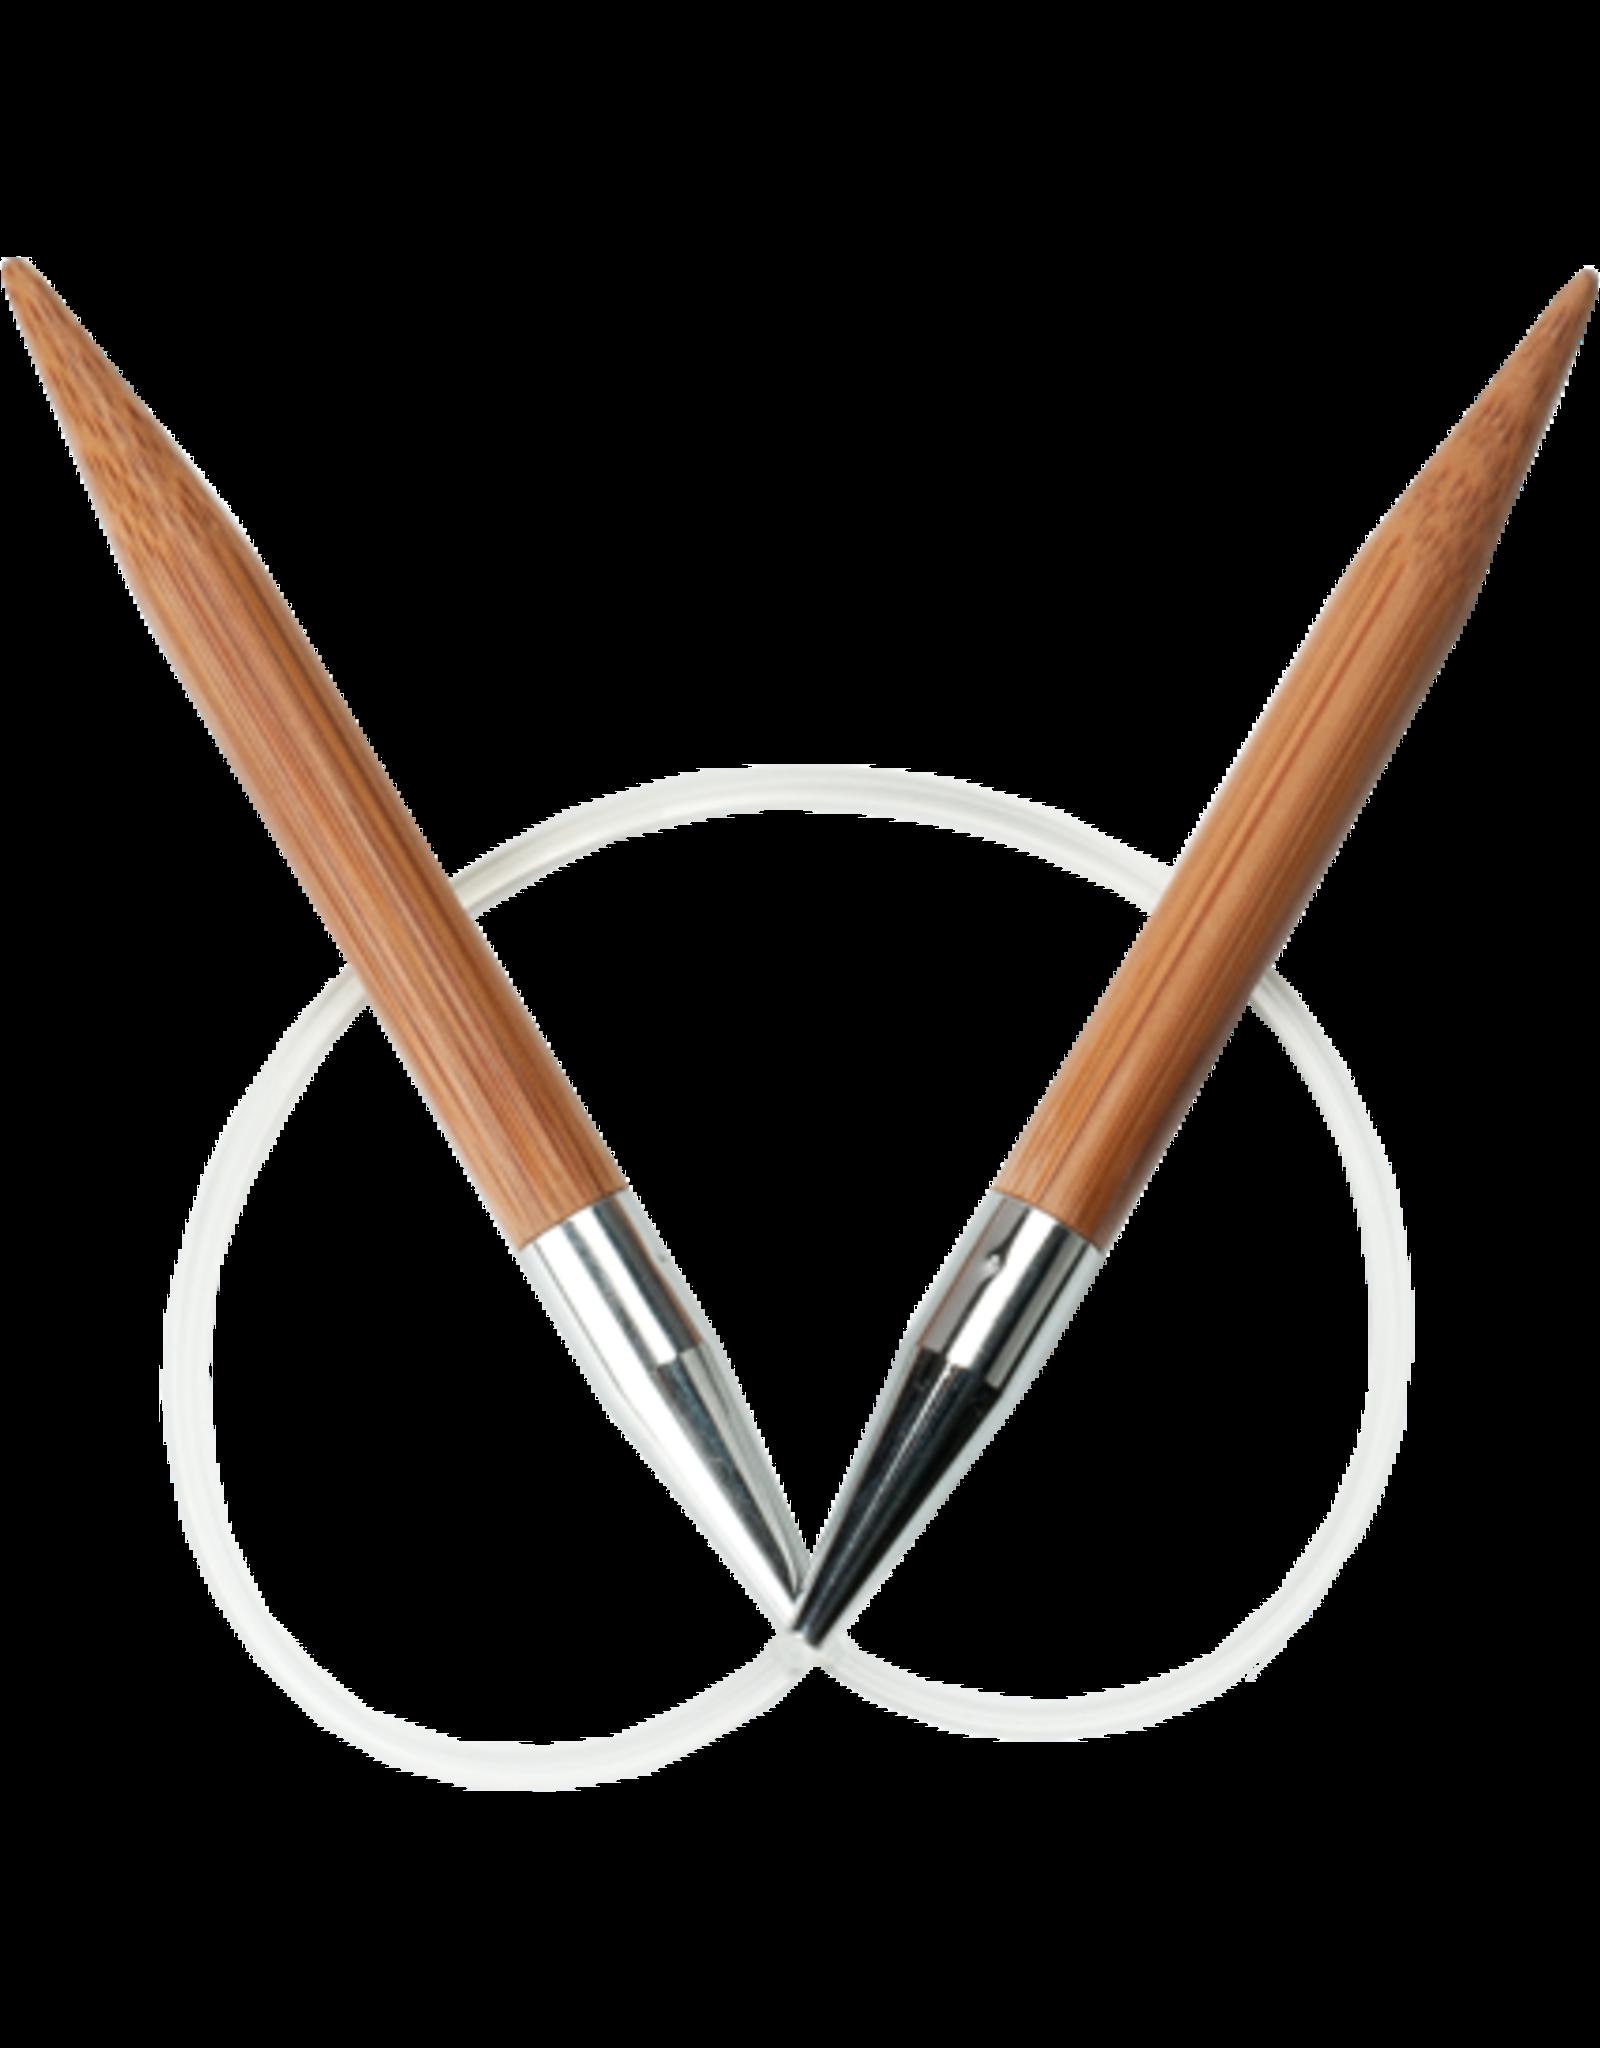 ChiaoGoo ChiaoGoo Bamboo Circular Knitting Needles